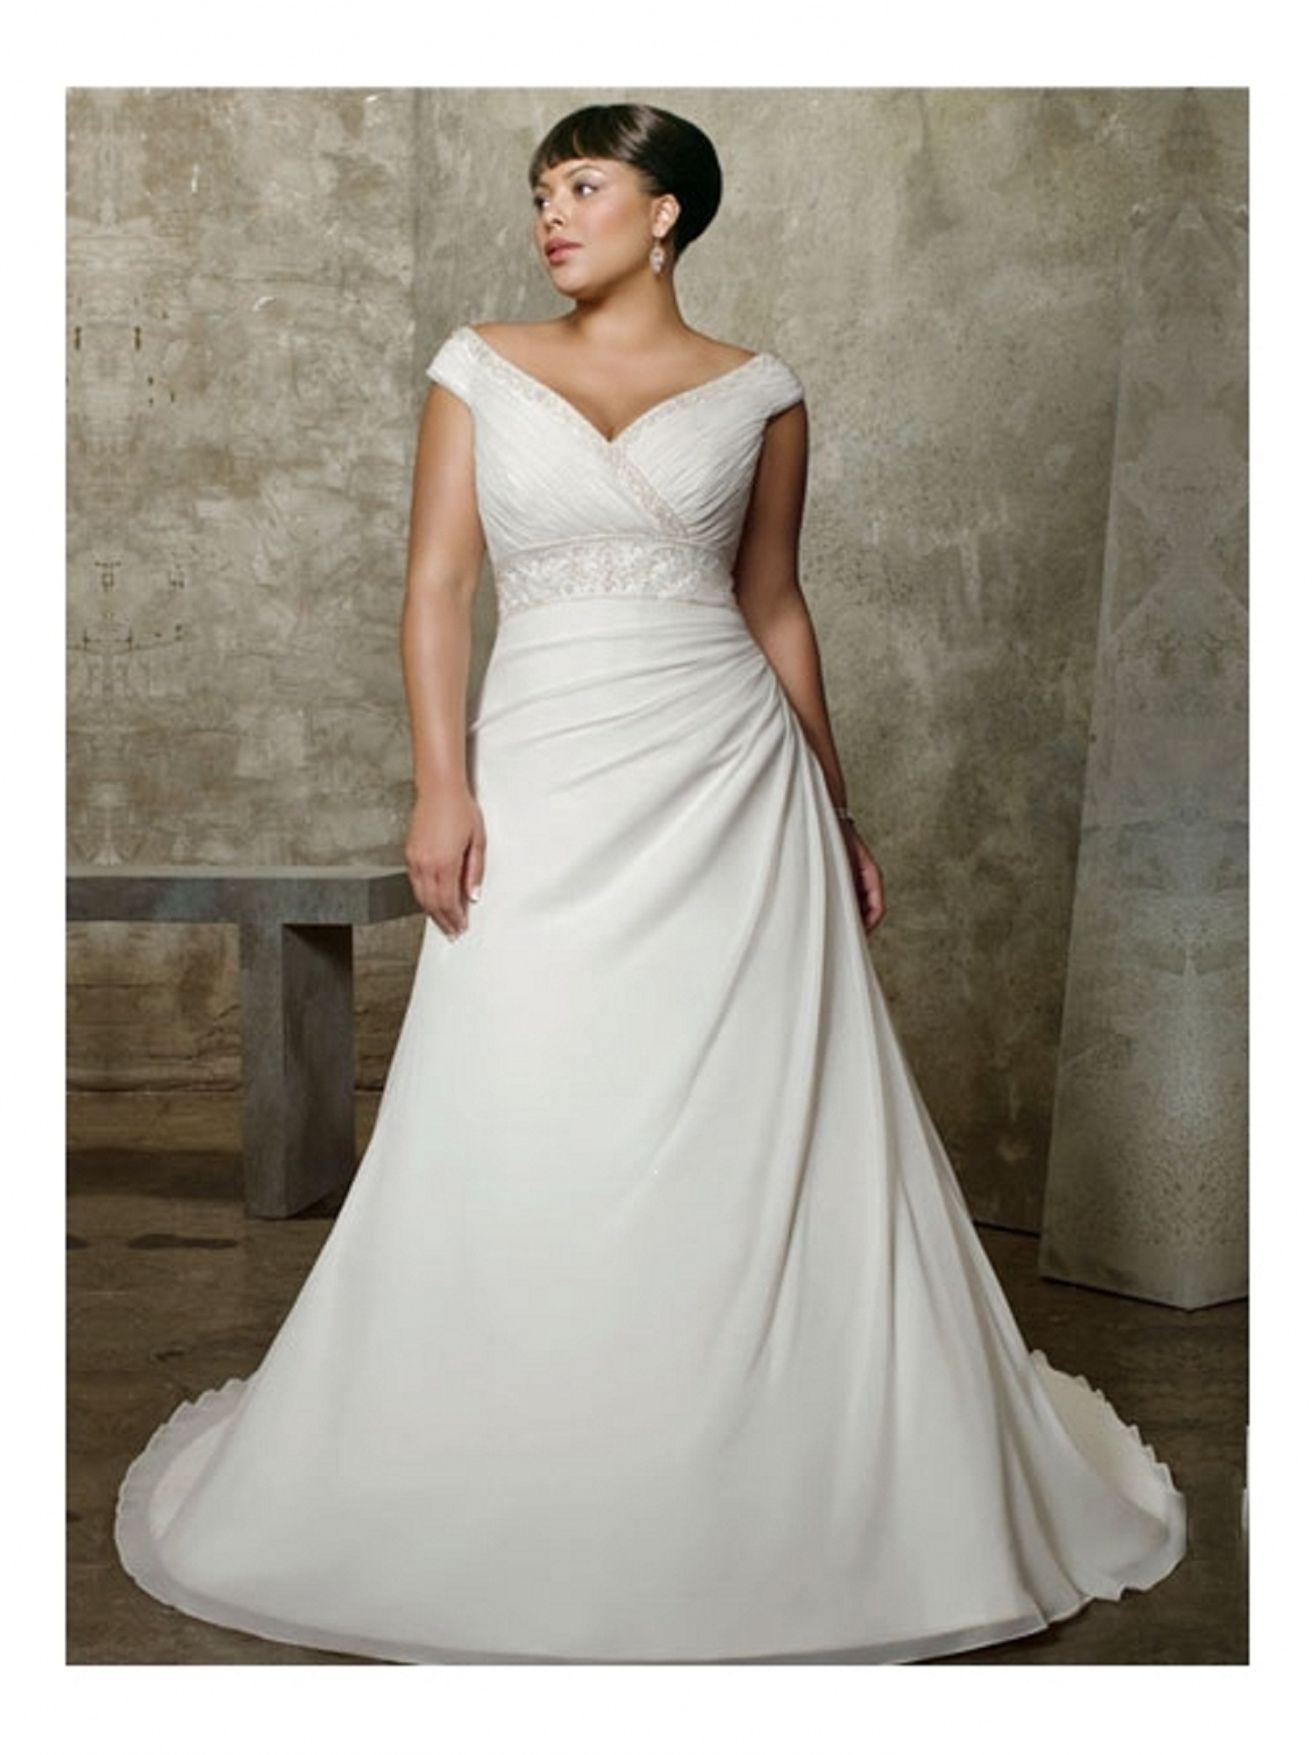 Wedding dresses for large busts   Wedding Dresses for Big Busts  Womenus Dresses for Weddings